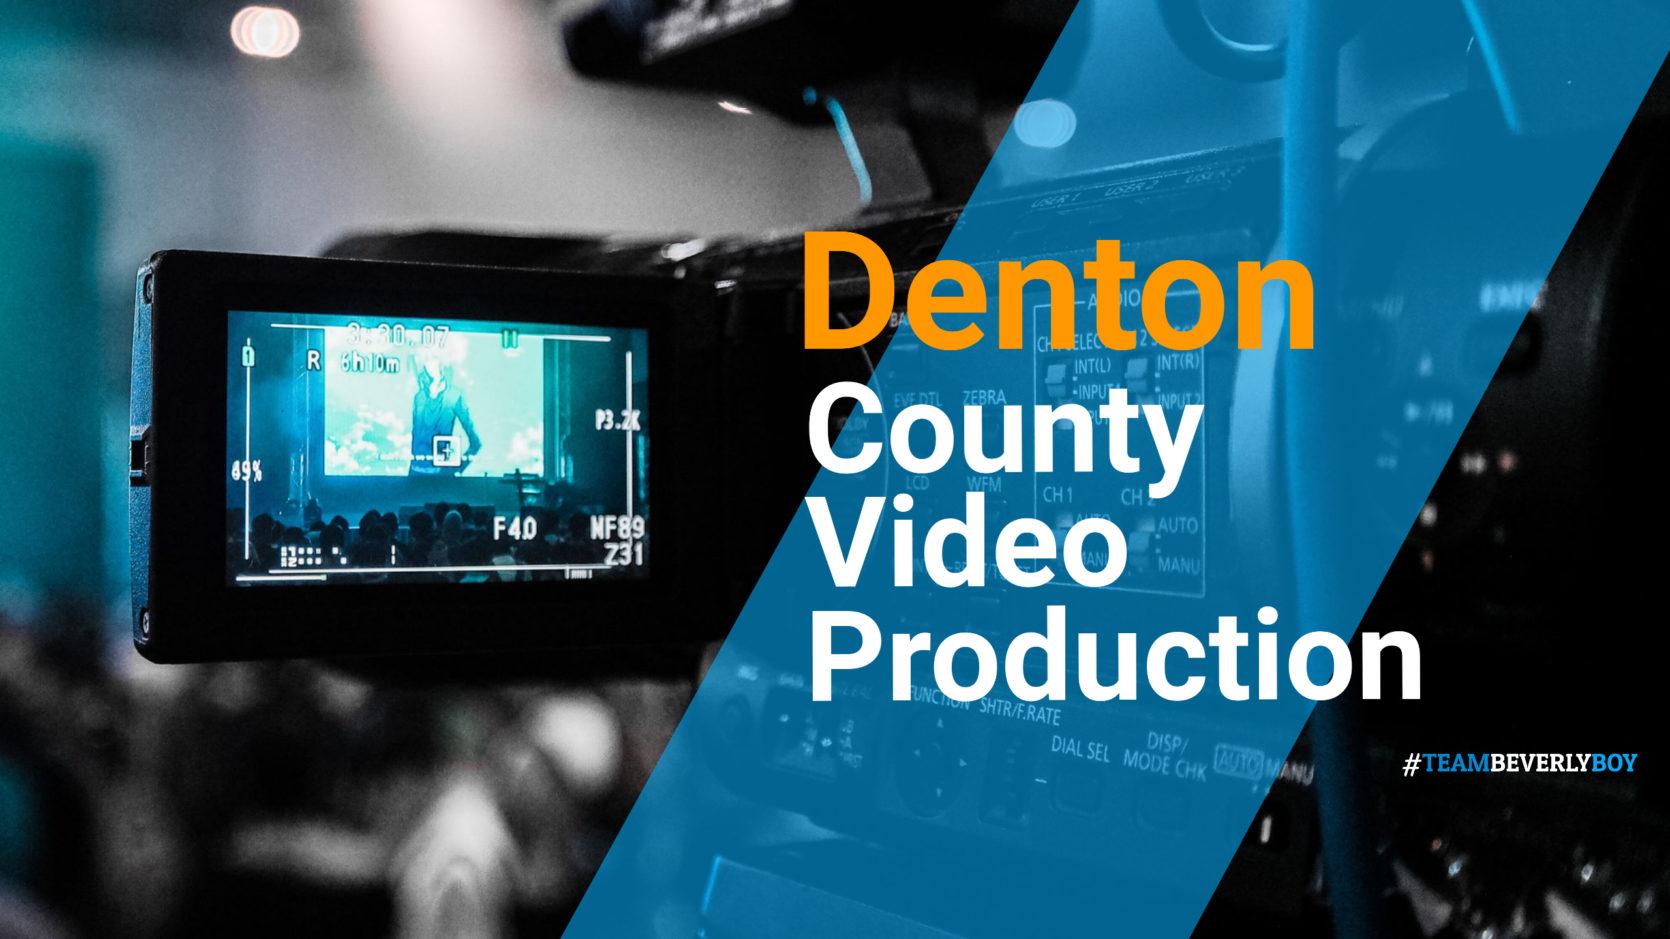 Denton County Video Production